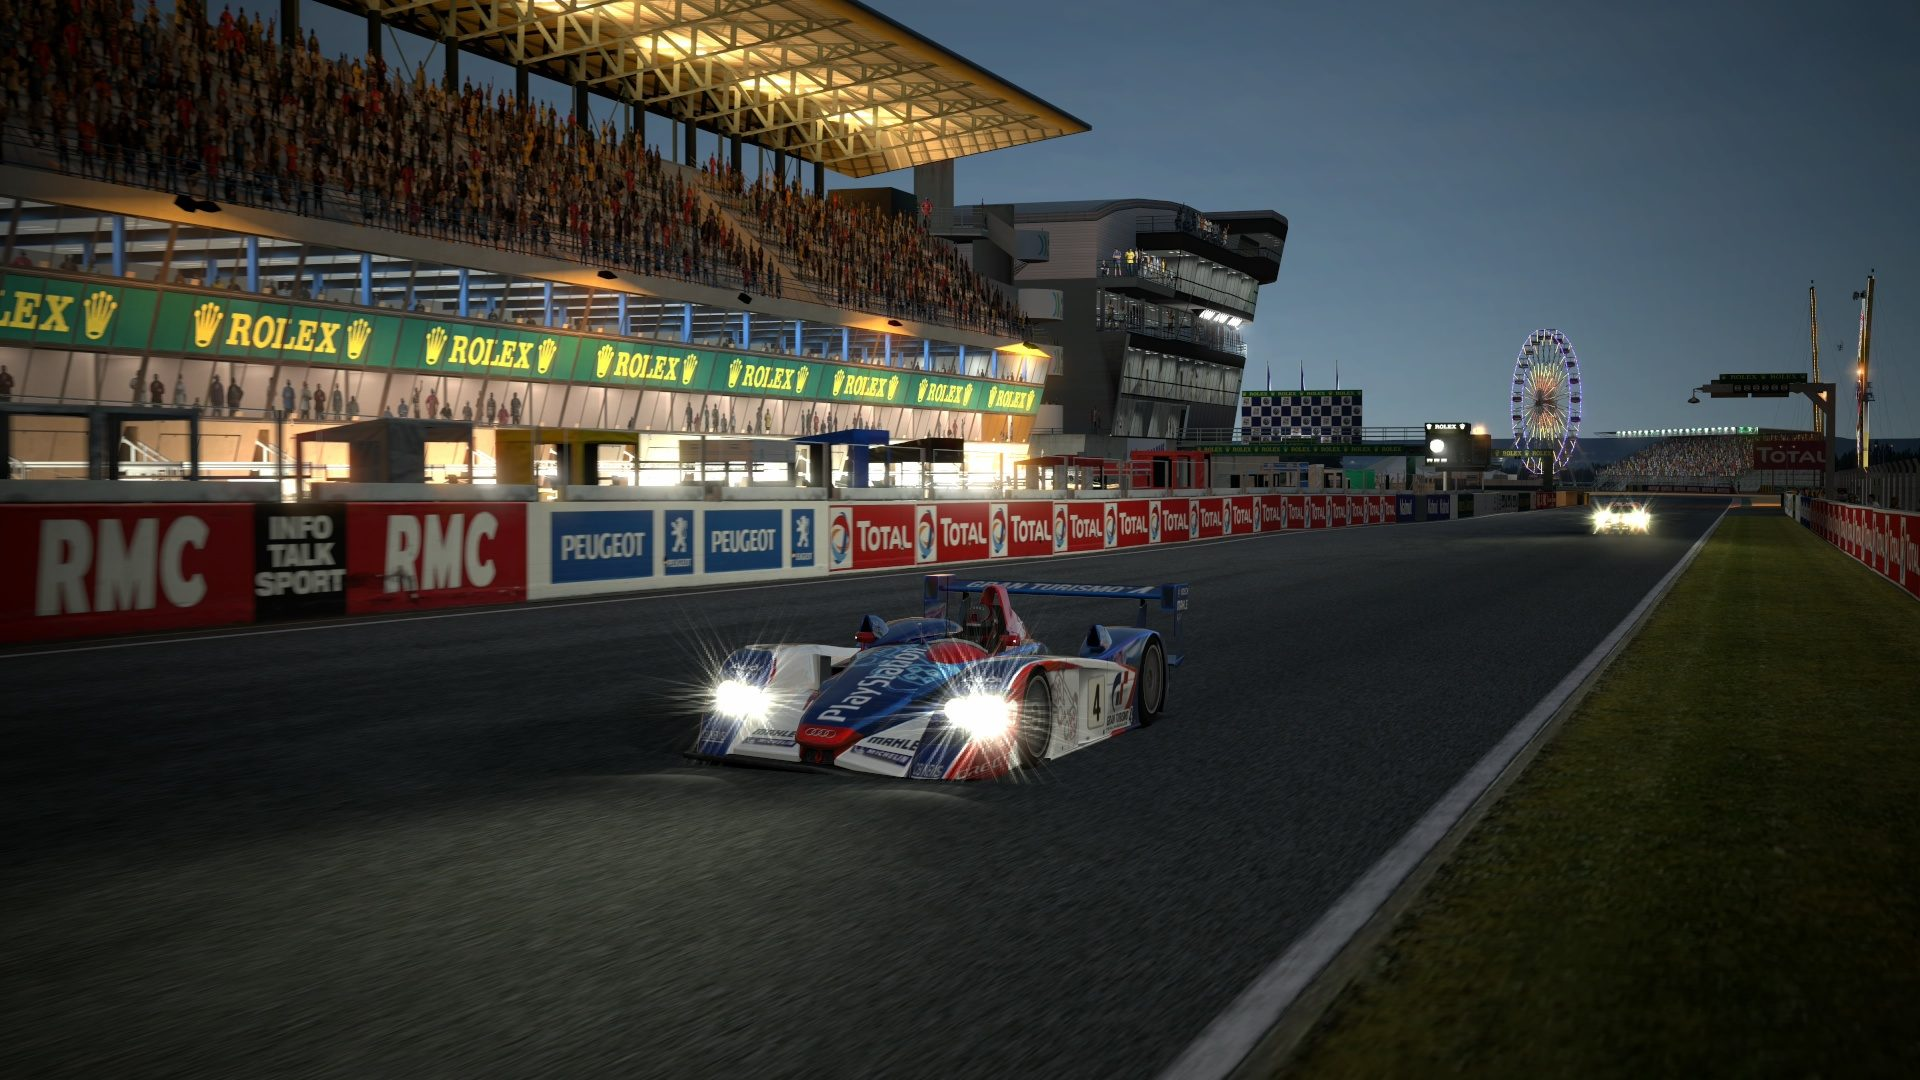 Circuit de la Sarthe 2009_6.jpg